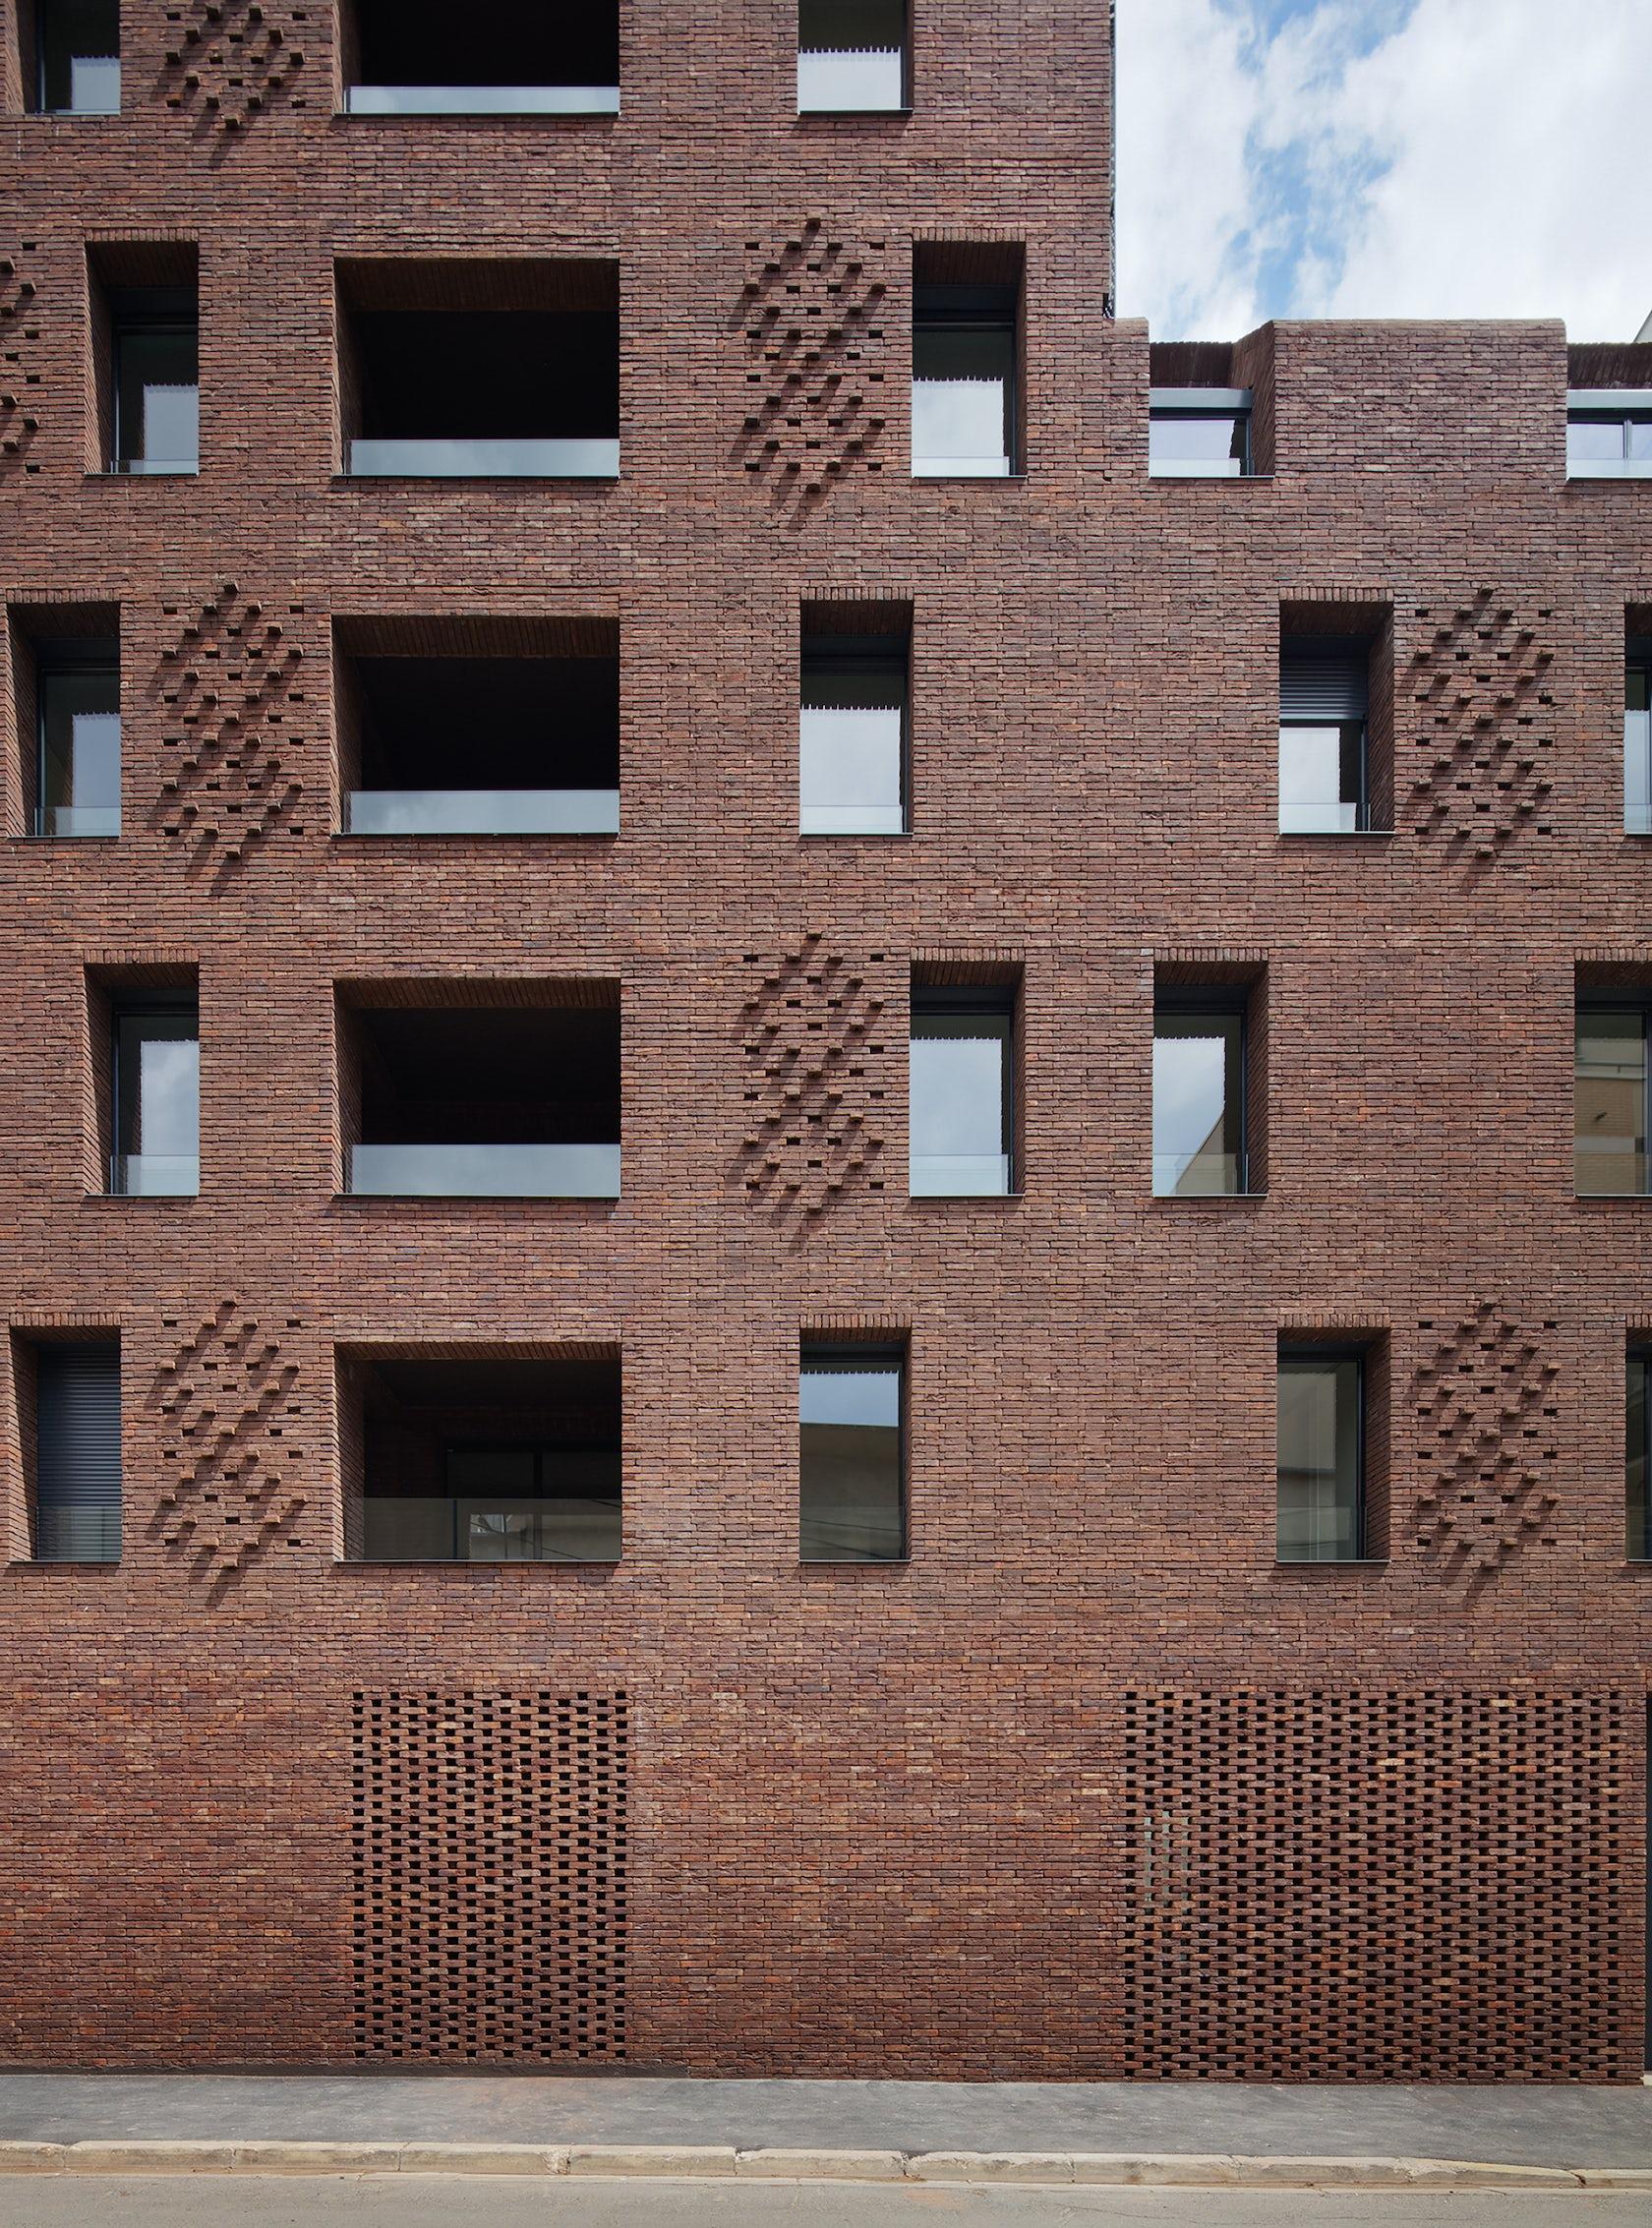 38 Housing units